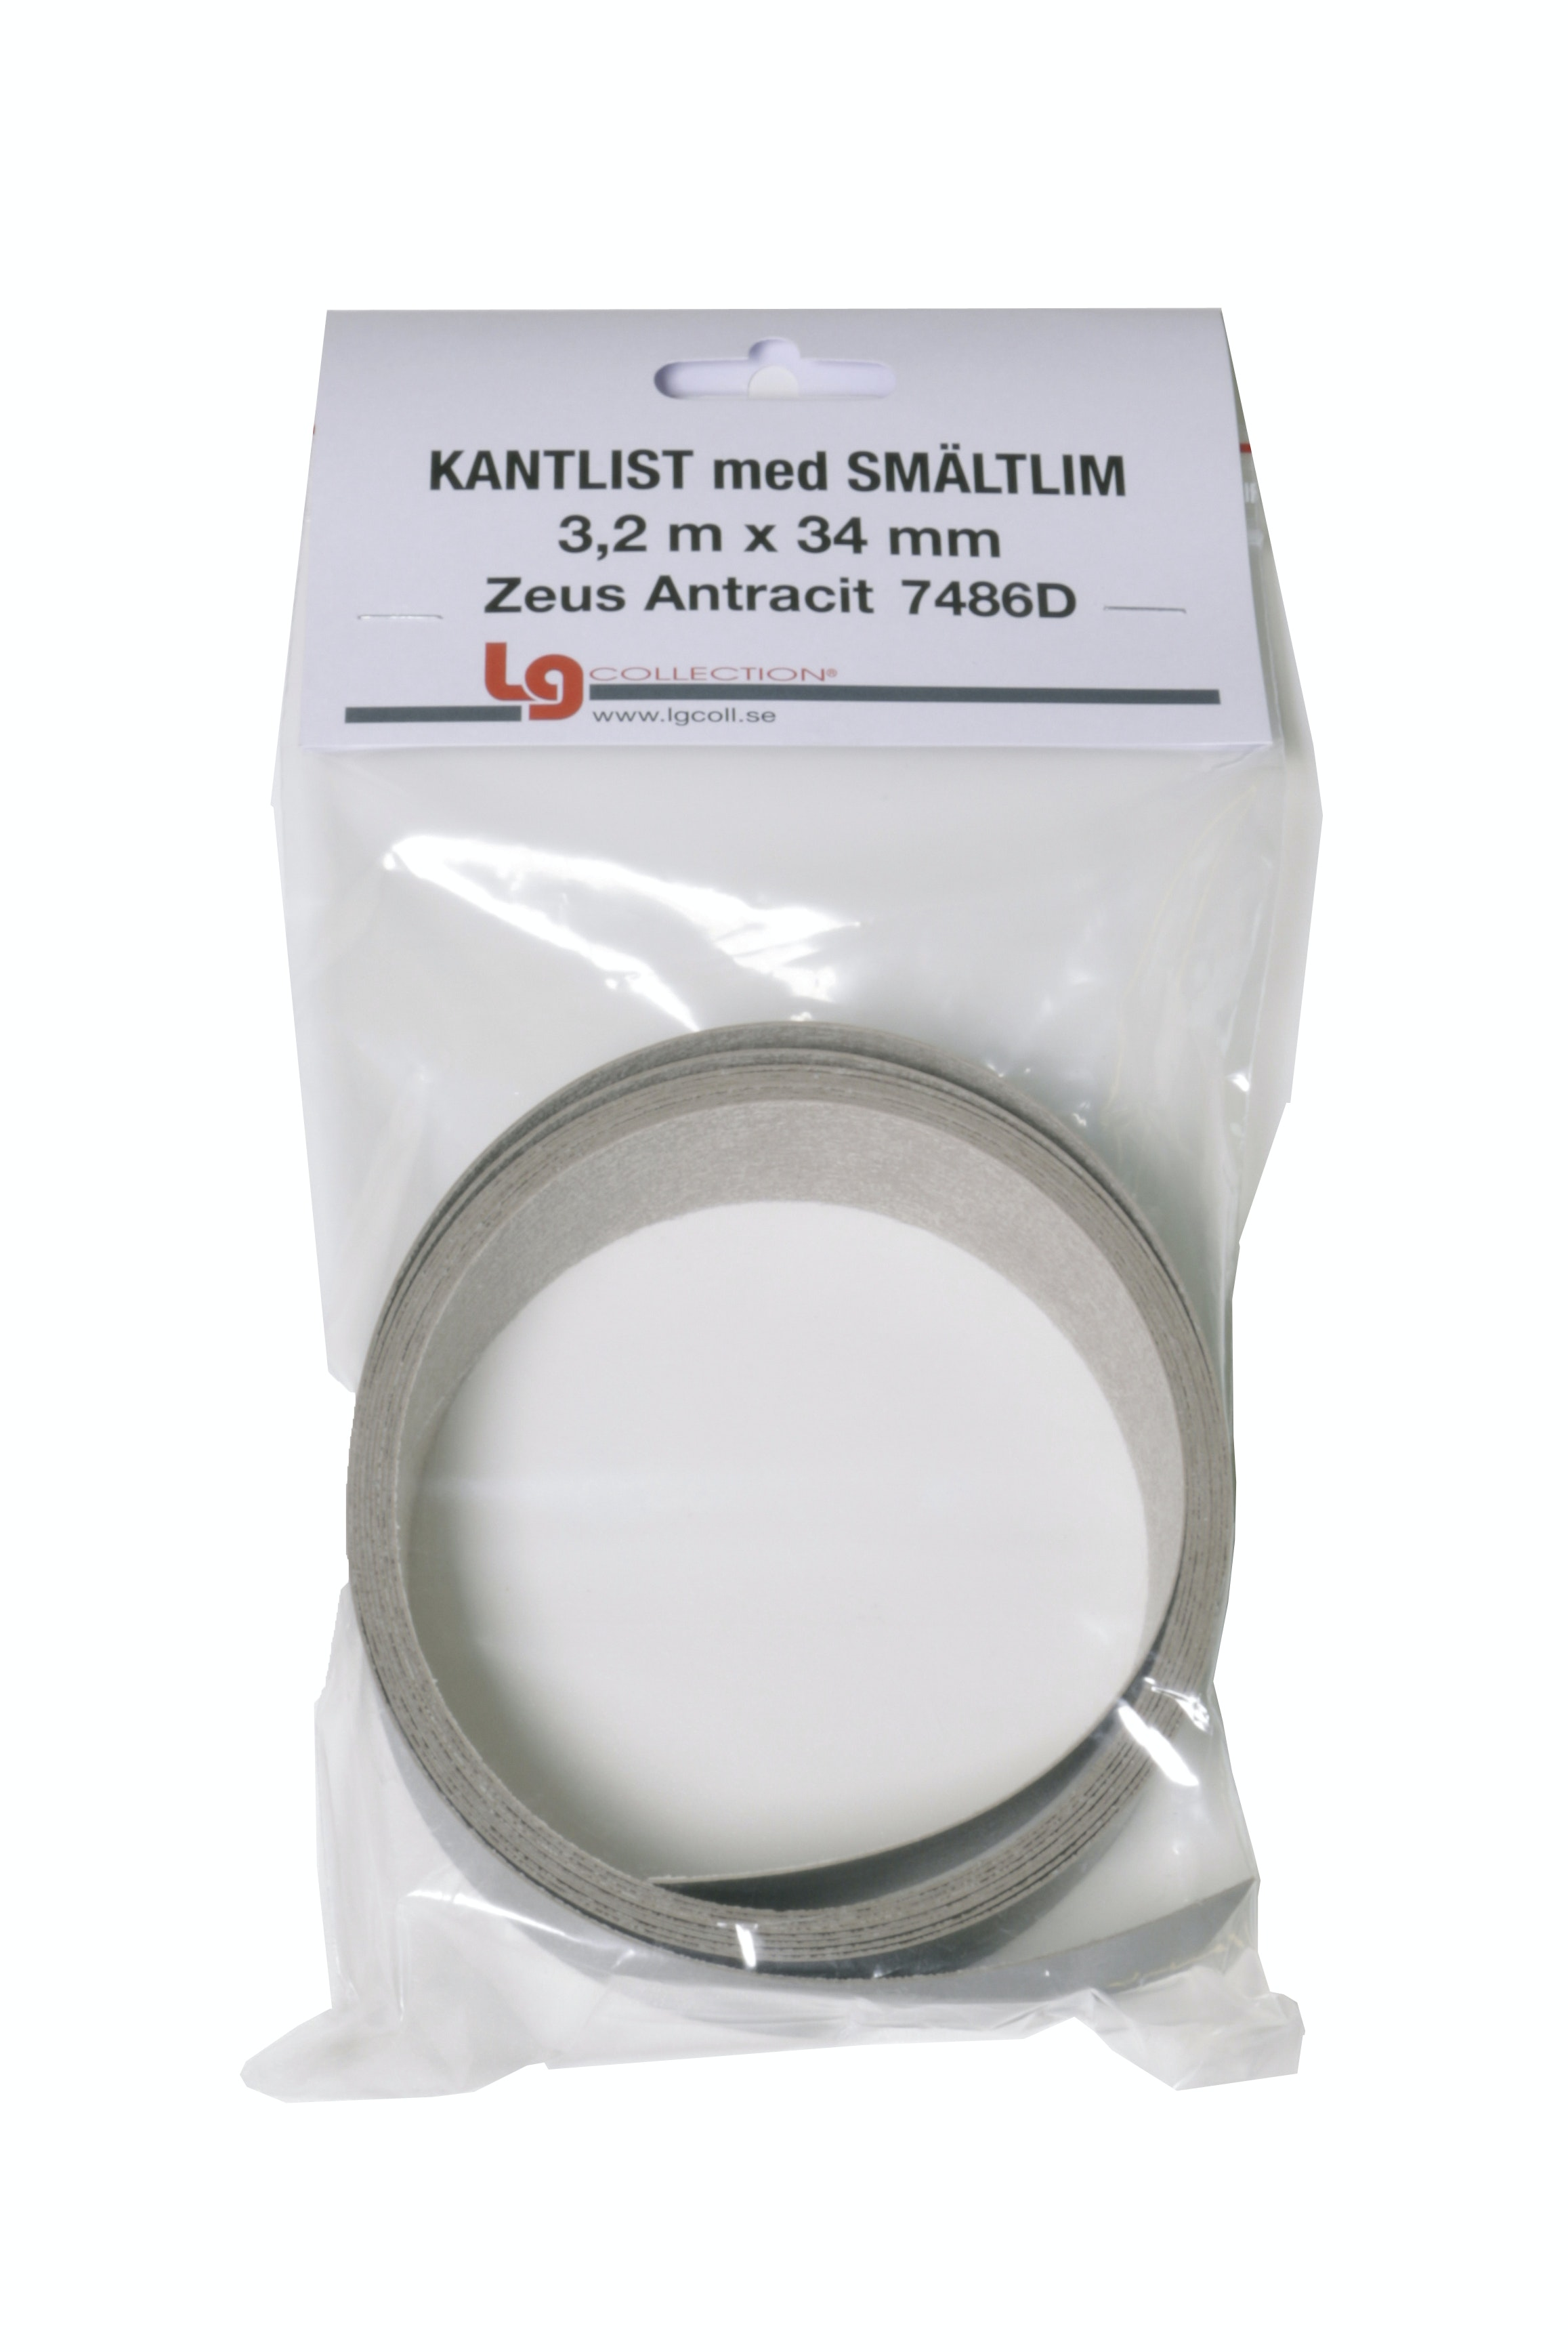 Kantband LG Collection Zeus Antracit 3,2Lpmx34mm